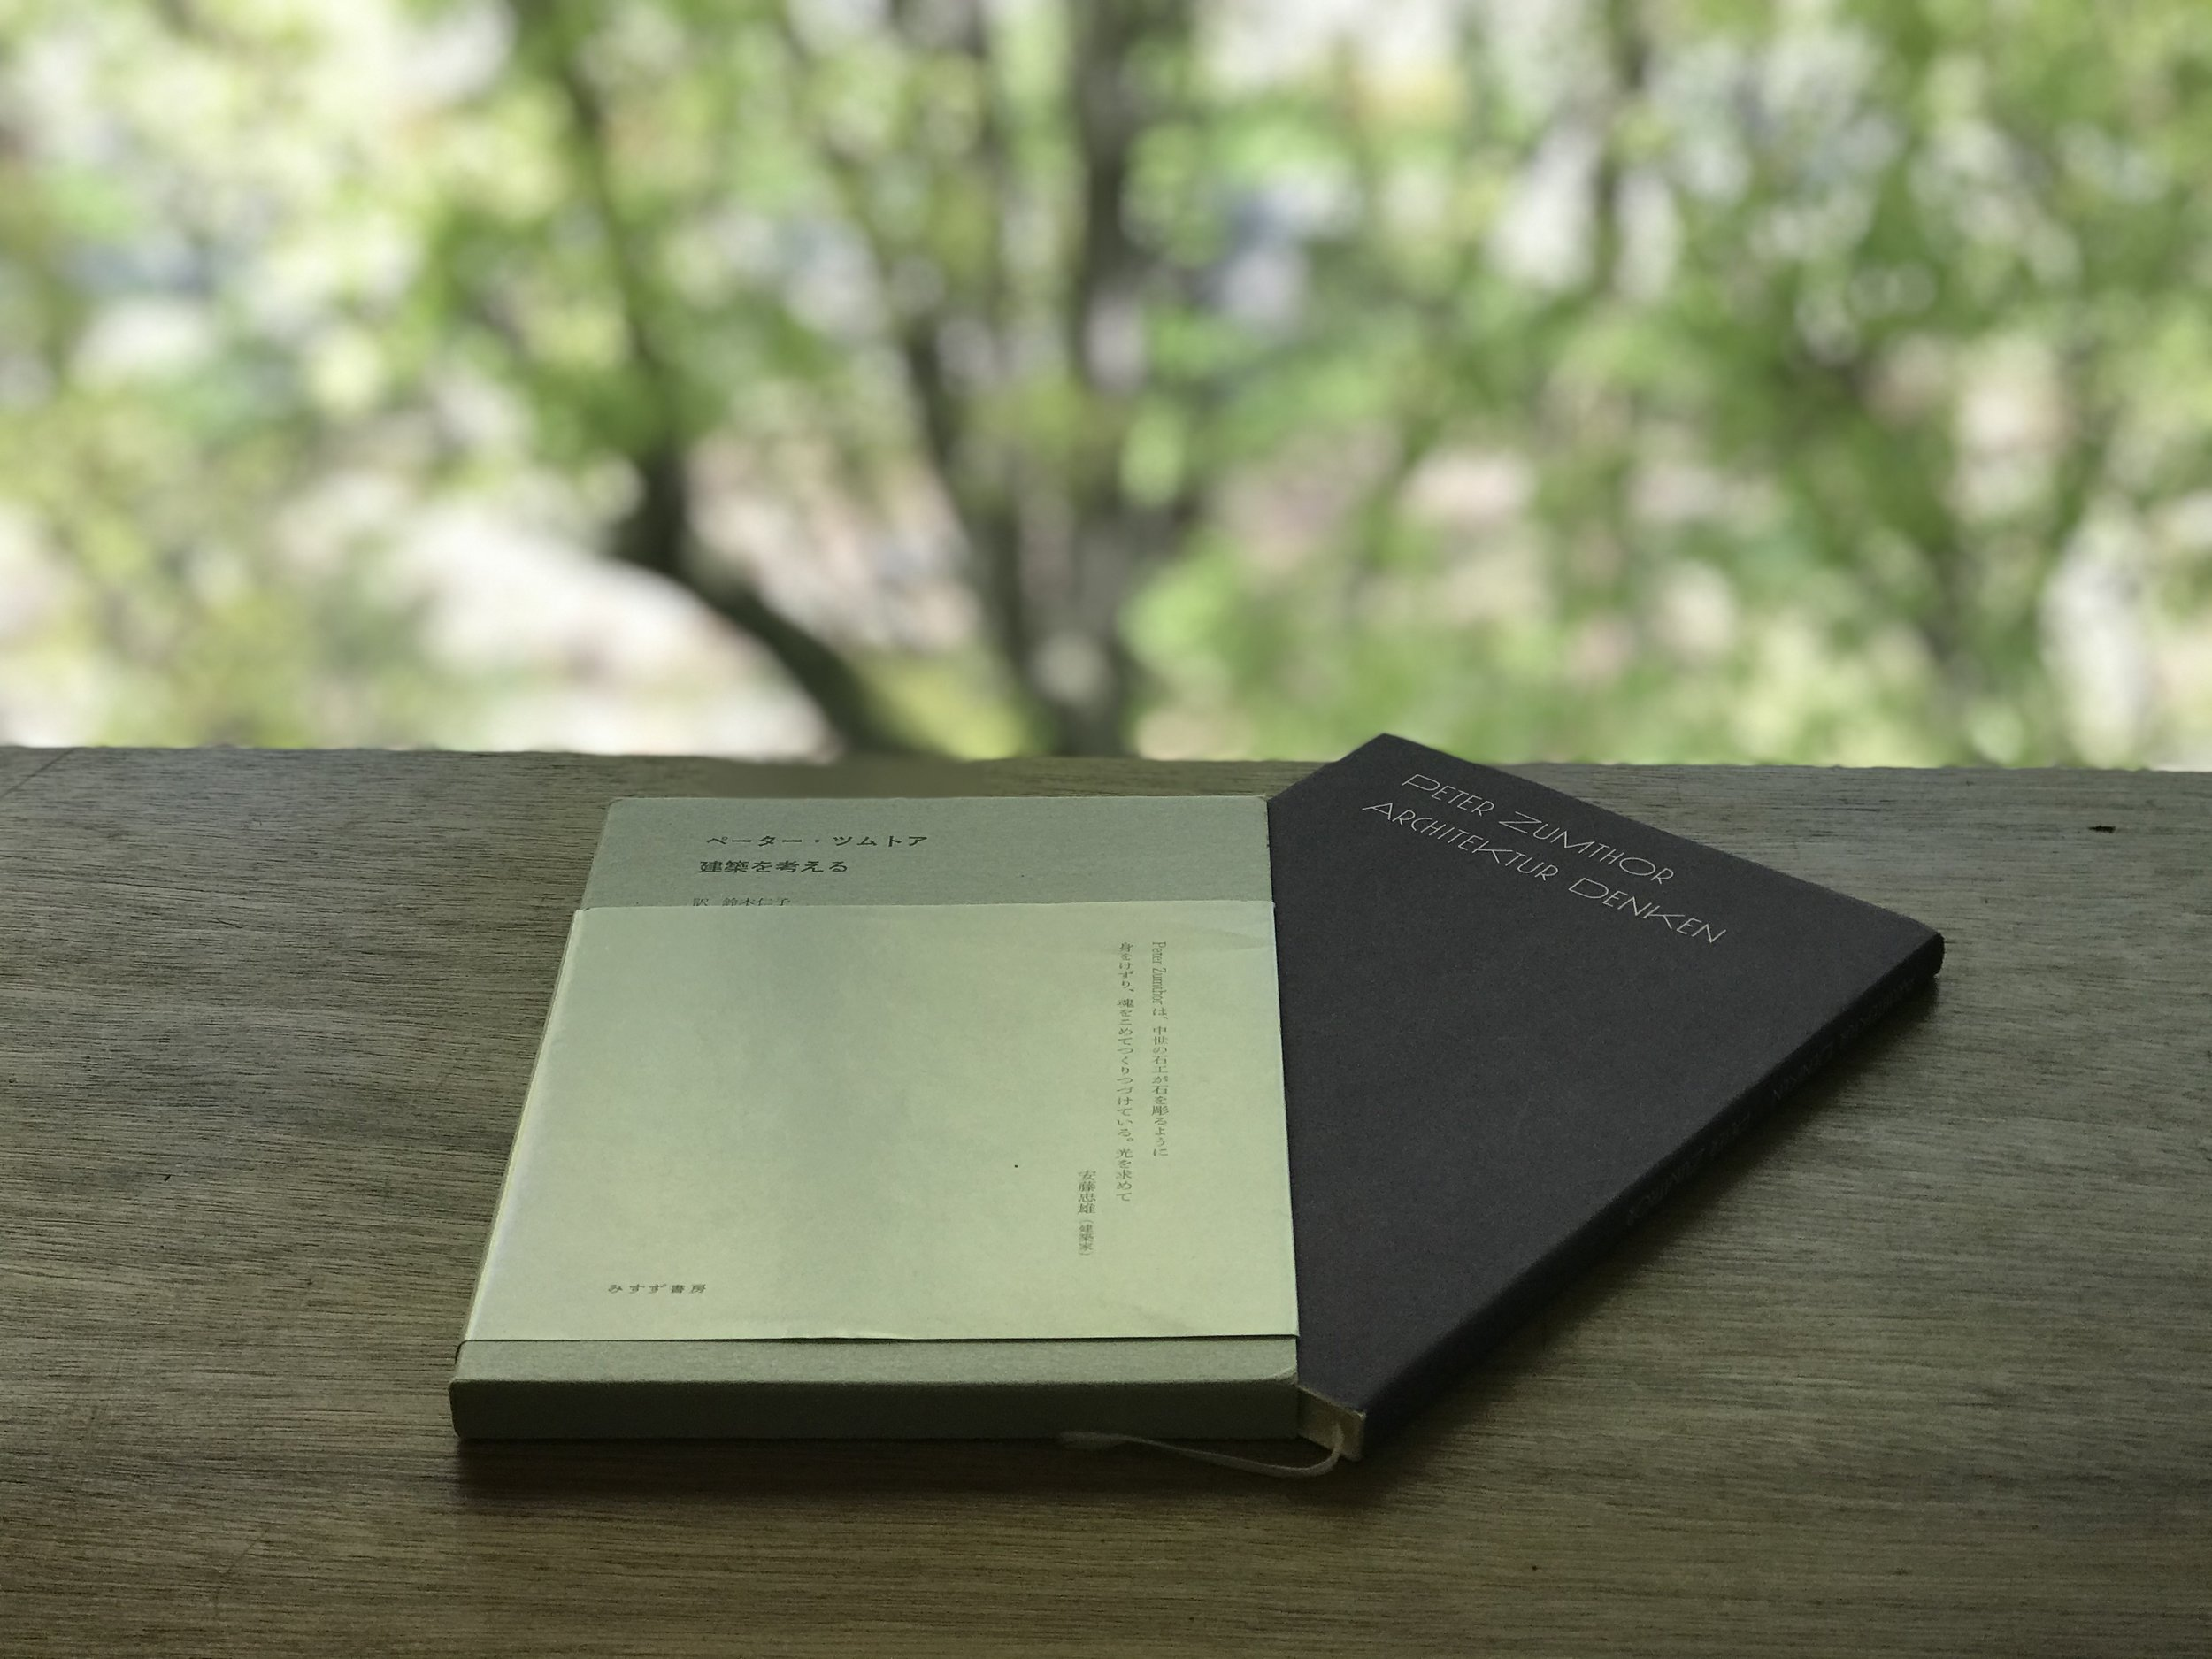 arbol-arbol-peterzumthor-book.jpg